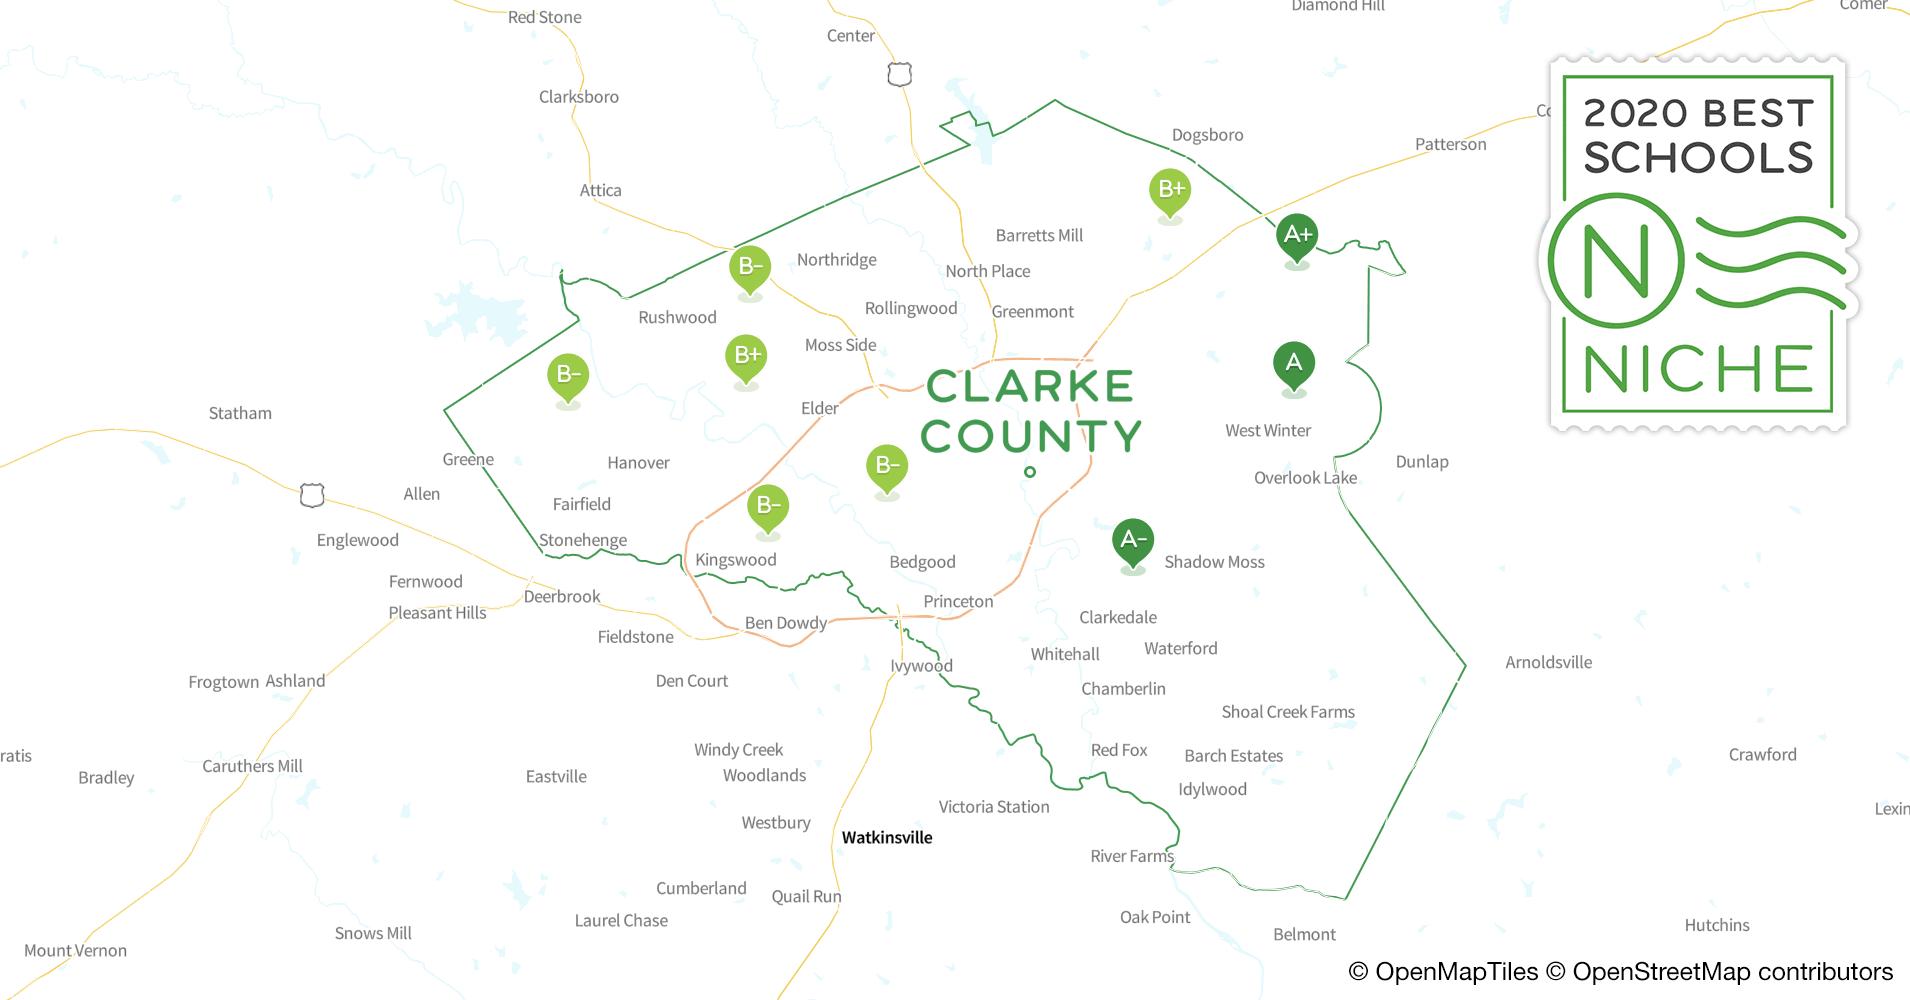 2020 Best Public Elementary Schools In Clarke County, Ga – Niche Regarding Athens Clarke County School Schedule